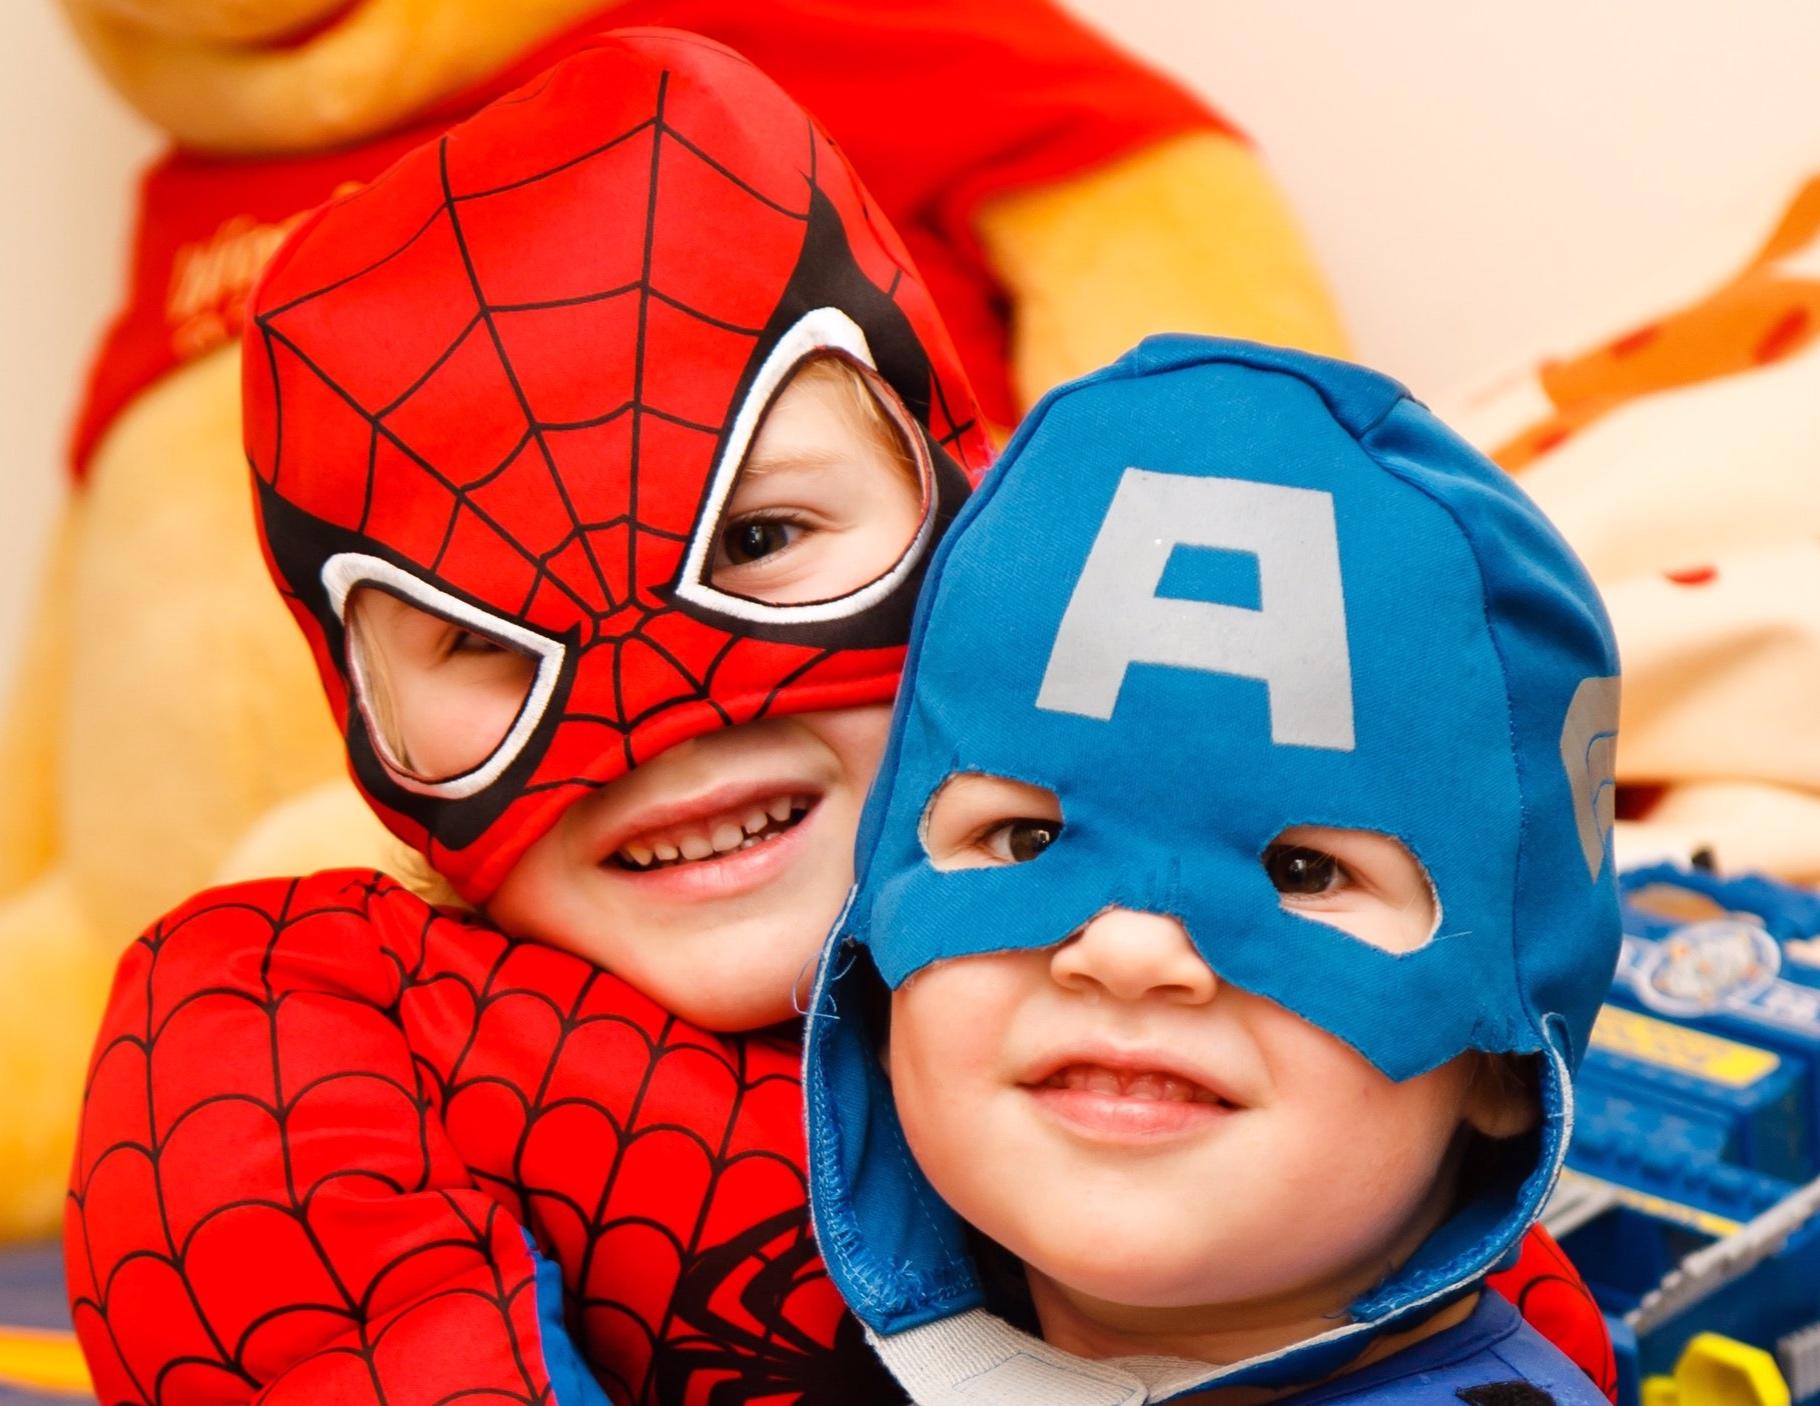 kids+superhero+steven-libralon-570406-unsplash.jpg